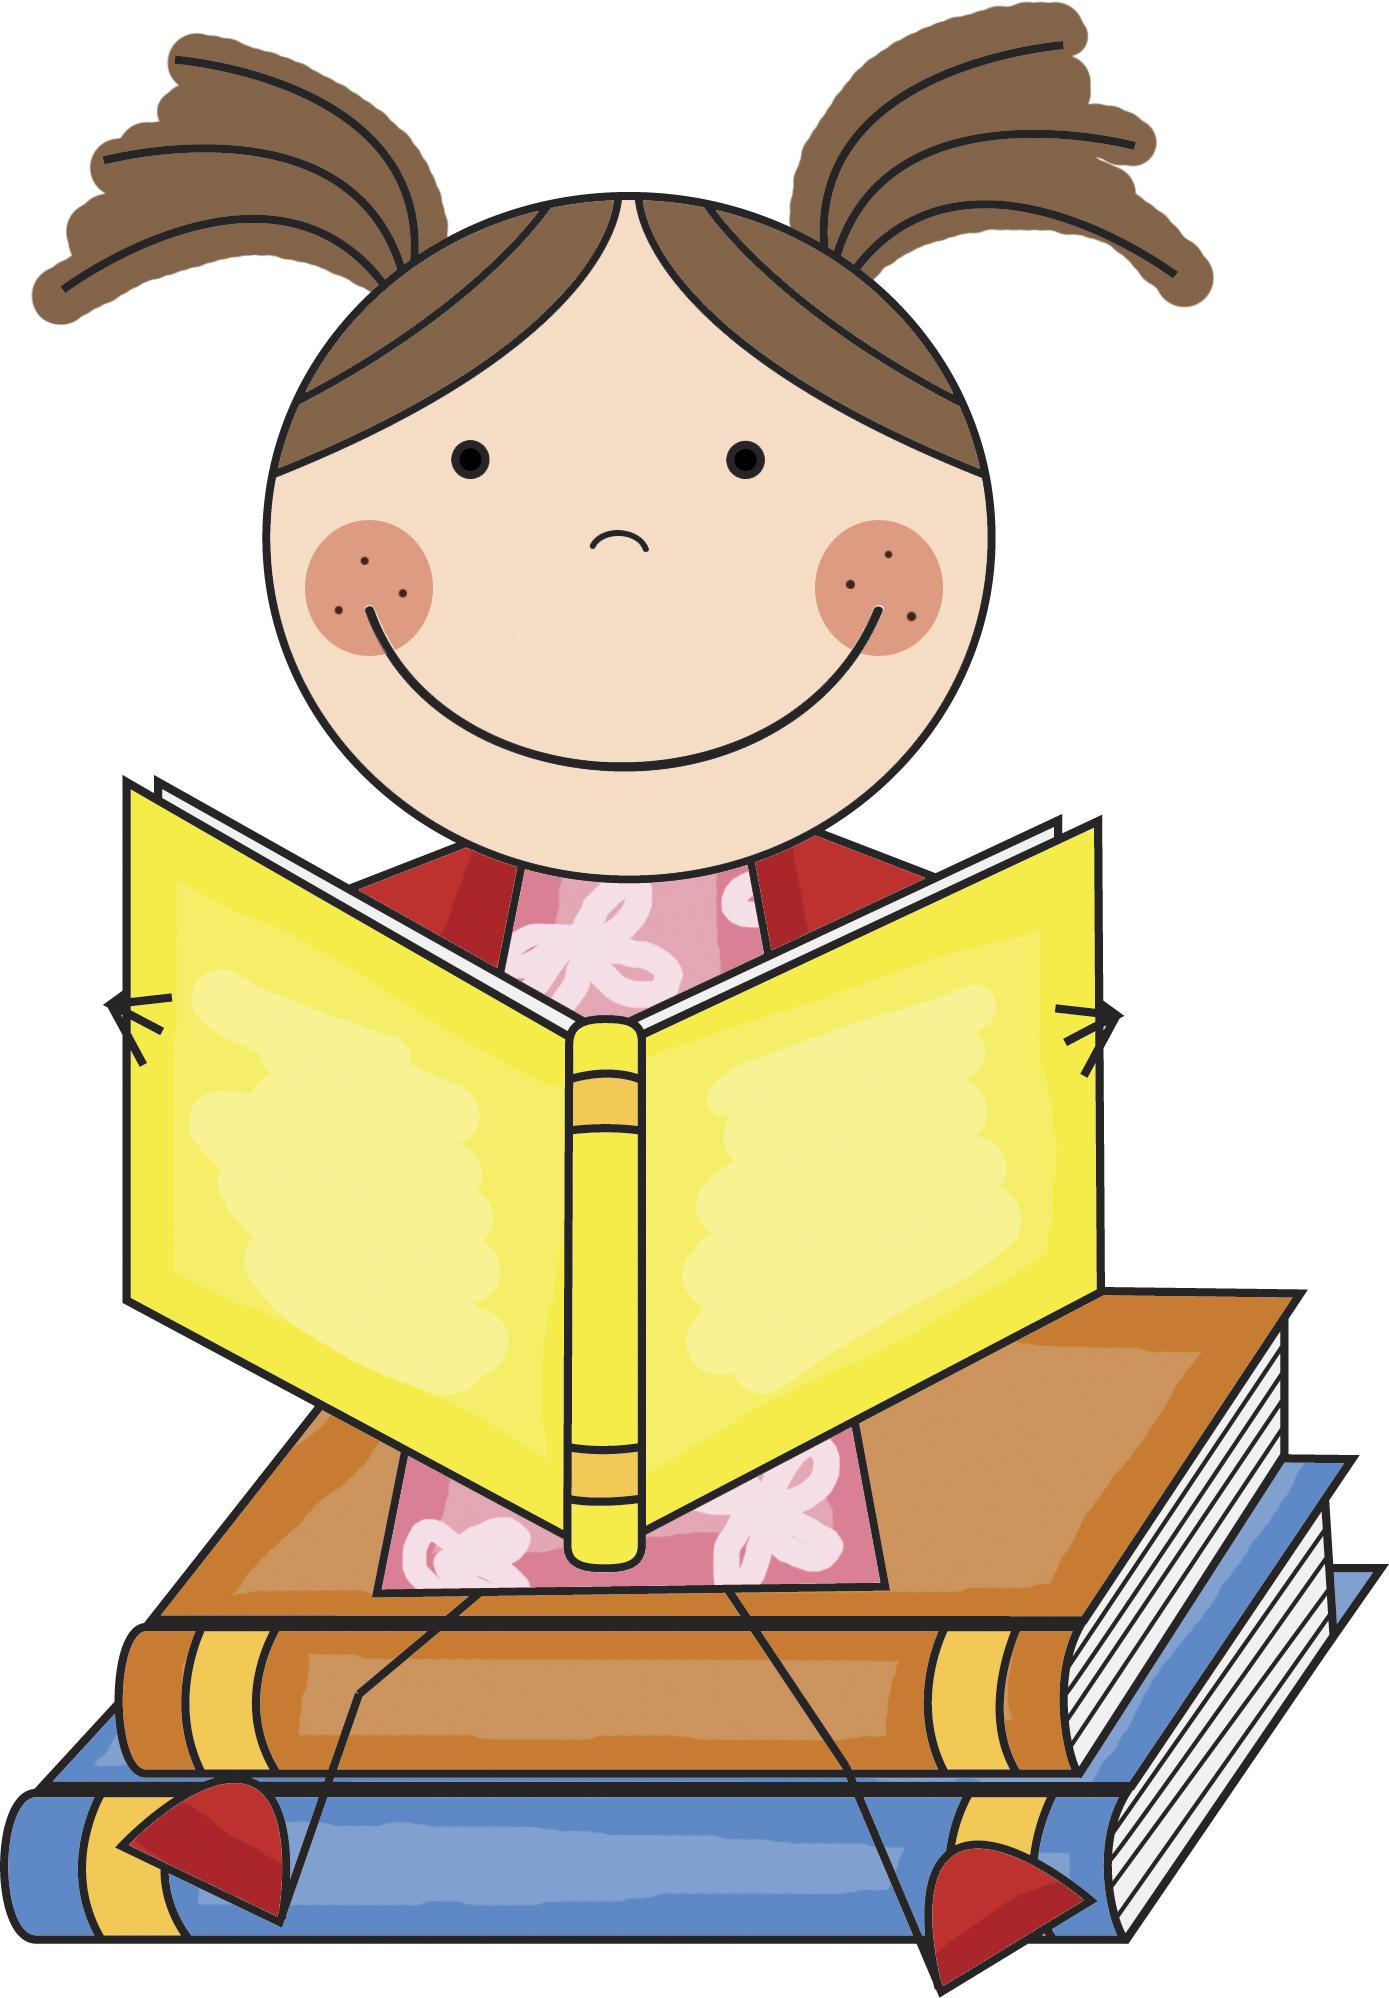 Free Reader Cliparts, Download Free Clip Art, Free Clip Art.